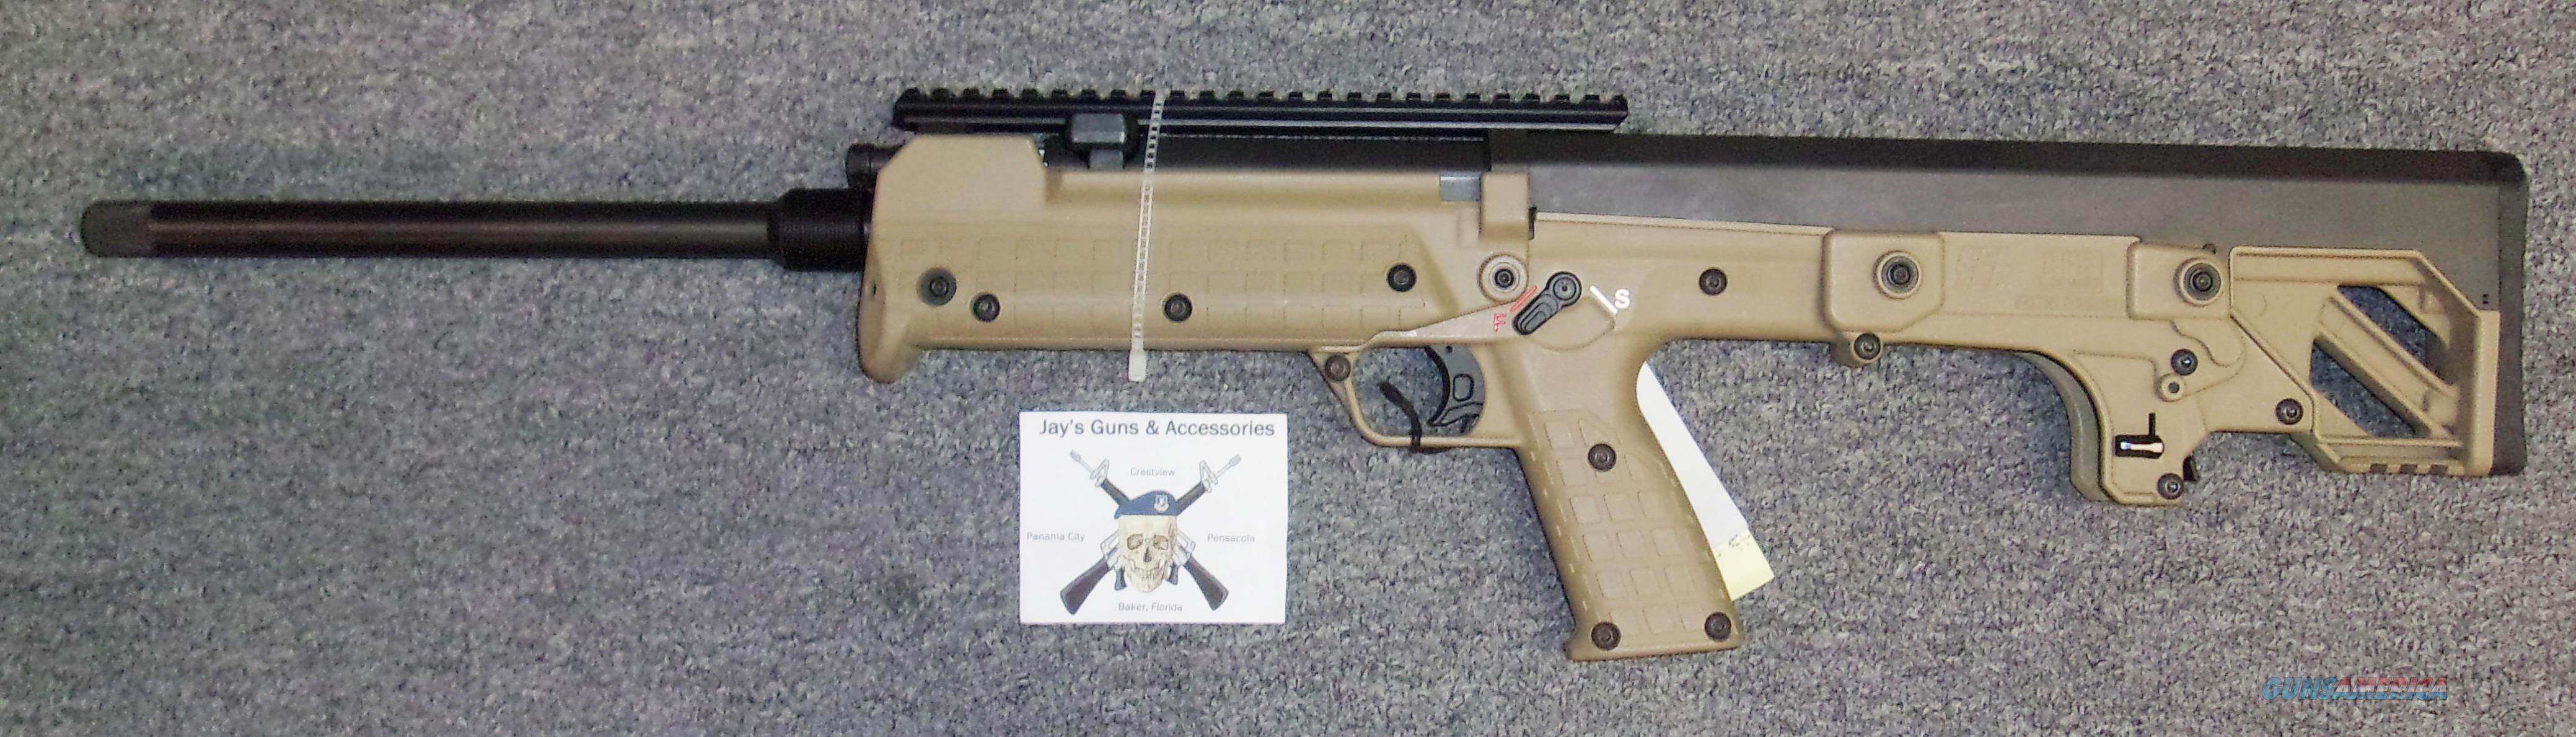 Kel-Tec RFB Hunter w/Tan Finish  Guns > Rifles > Kel-Tec Rifles